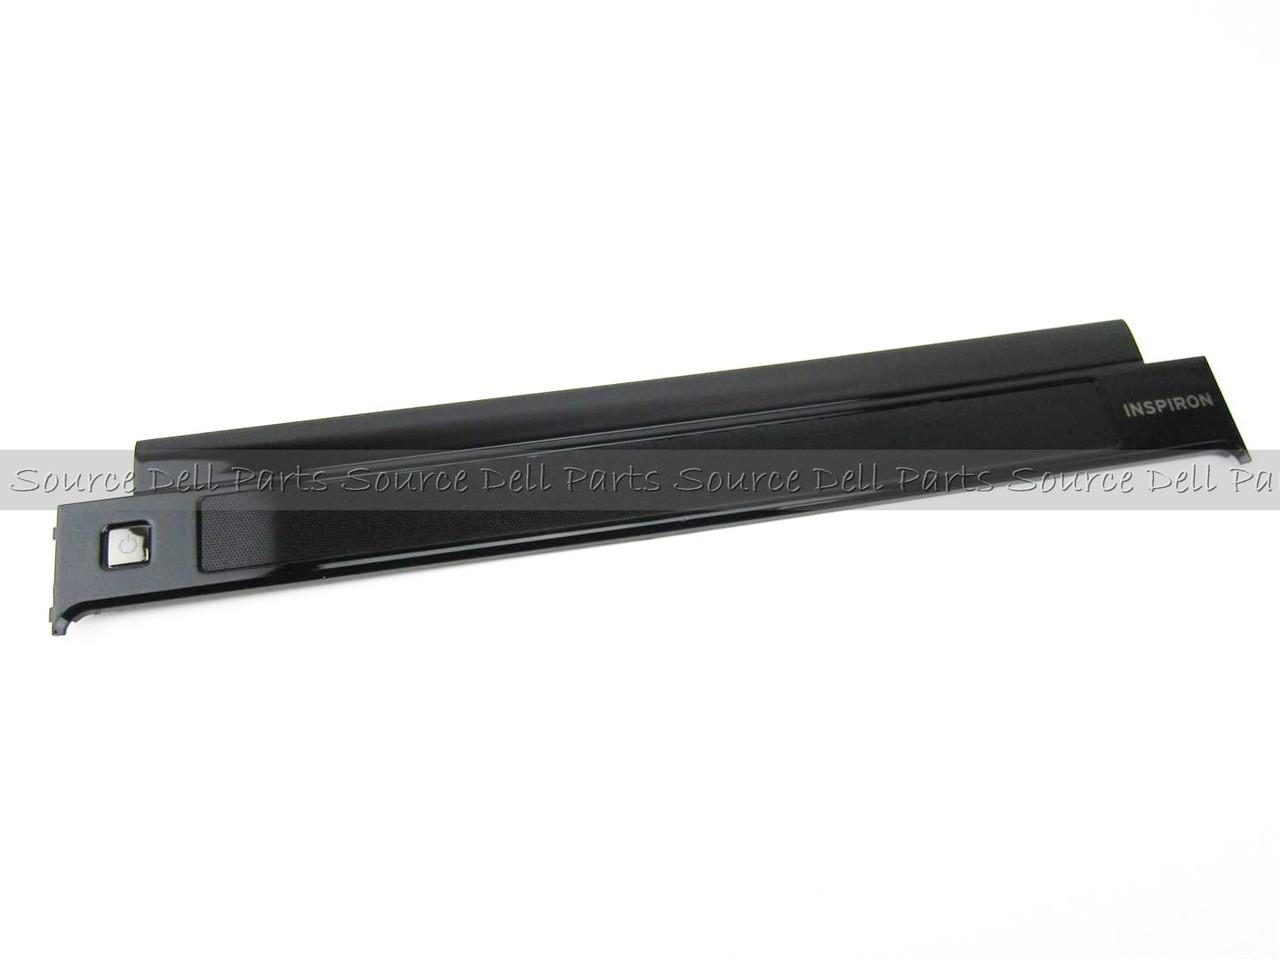 Dell Inspiron 1440 Center Control Power Button Cover - N177P